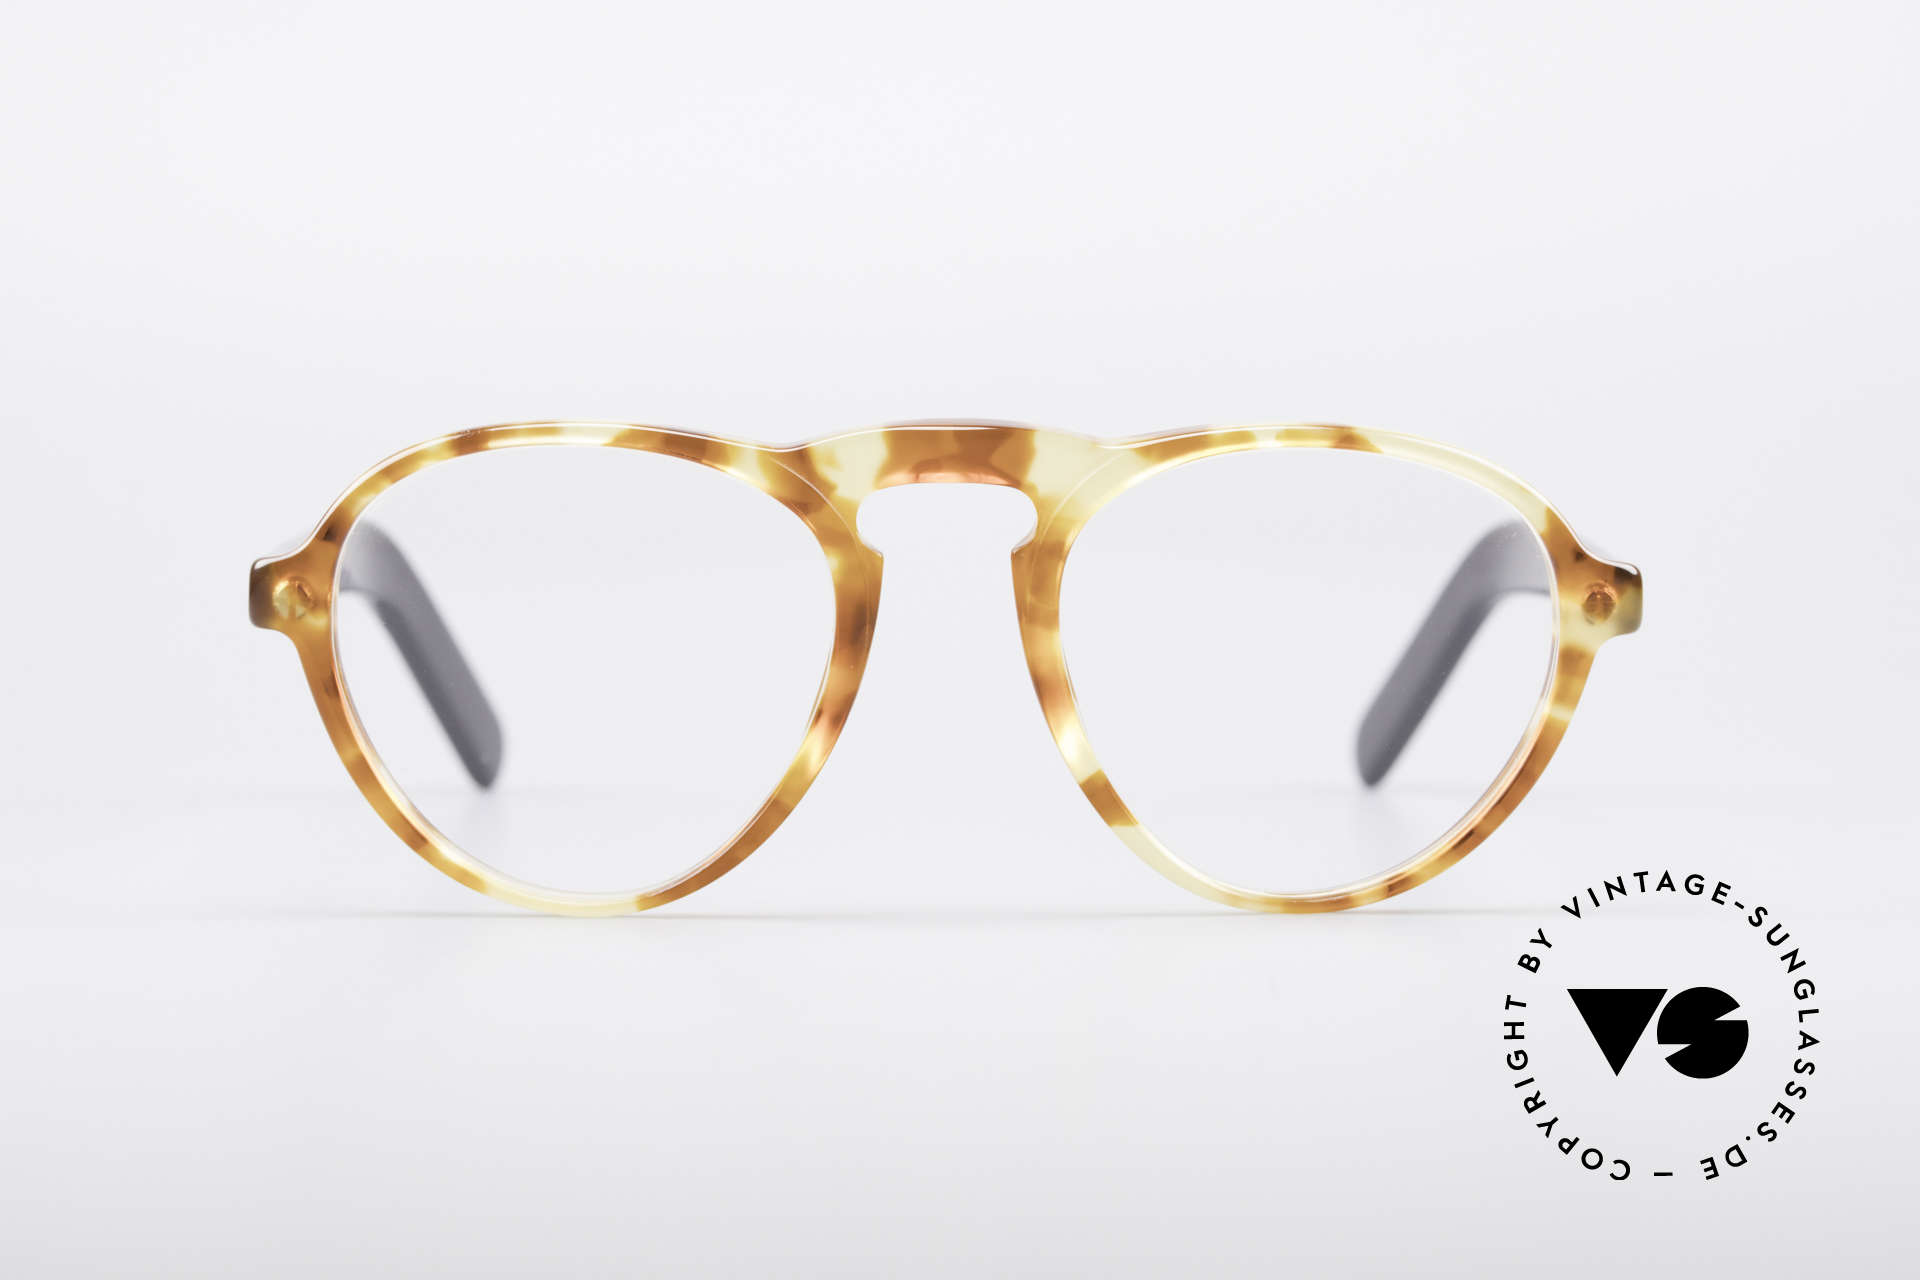 Giorgio Armani 315 True Vintage Eyeglass Frame, classic, timeless, elegant = characteristic of GA, Made for Men